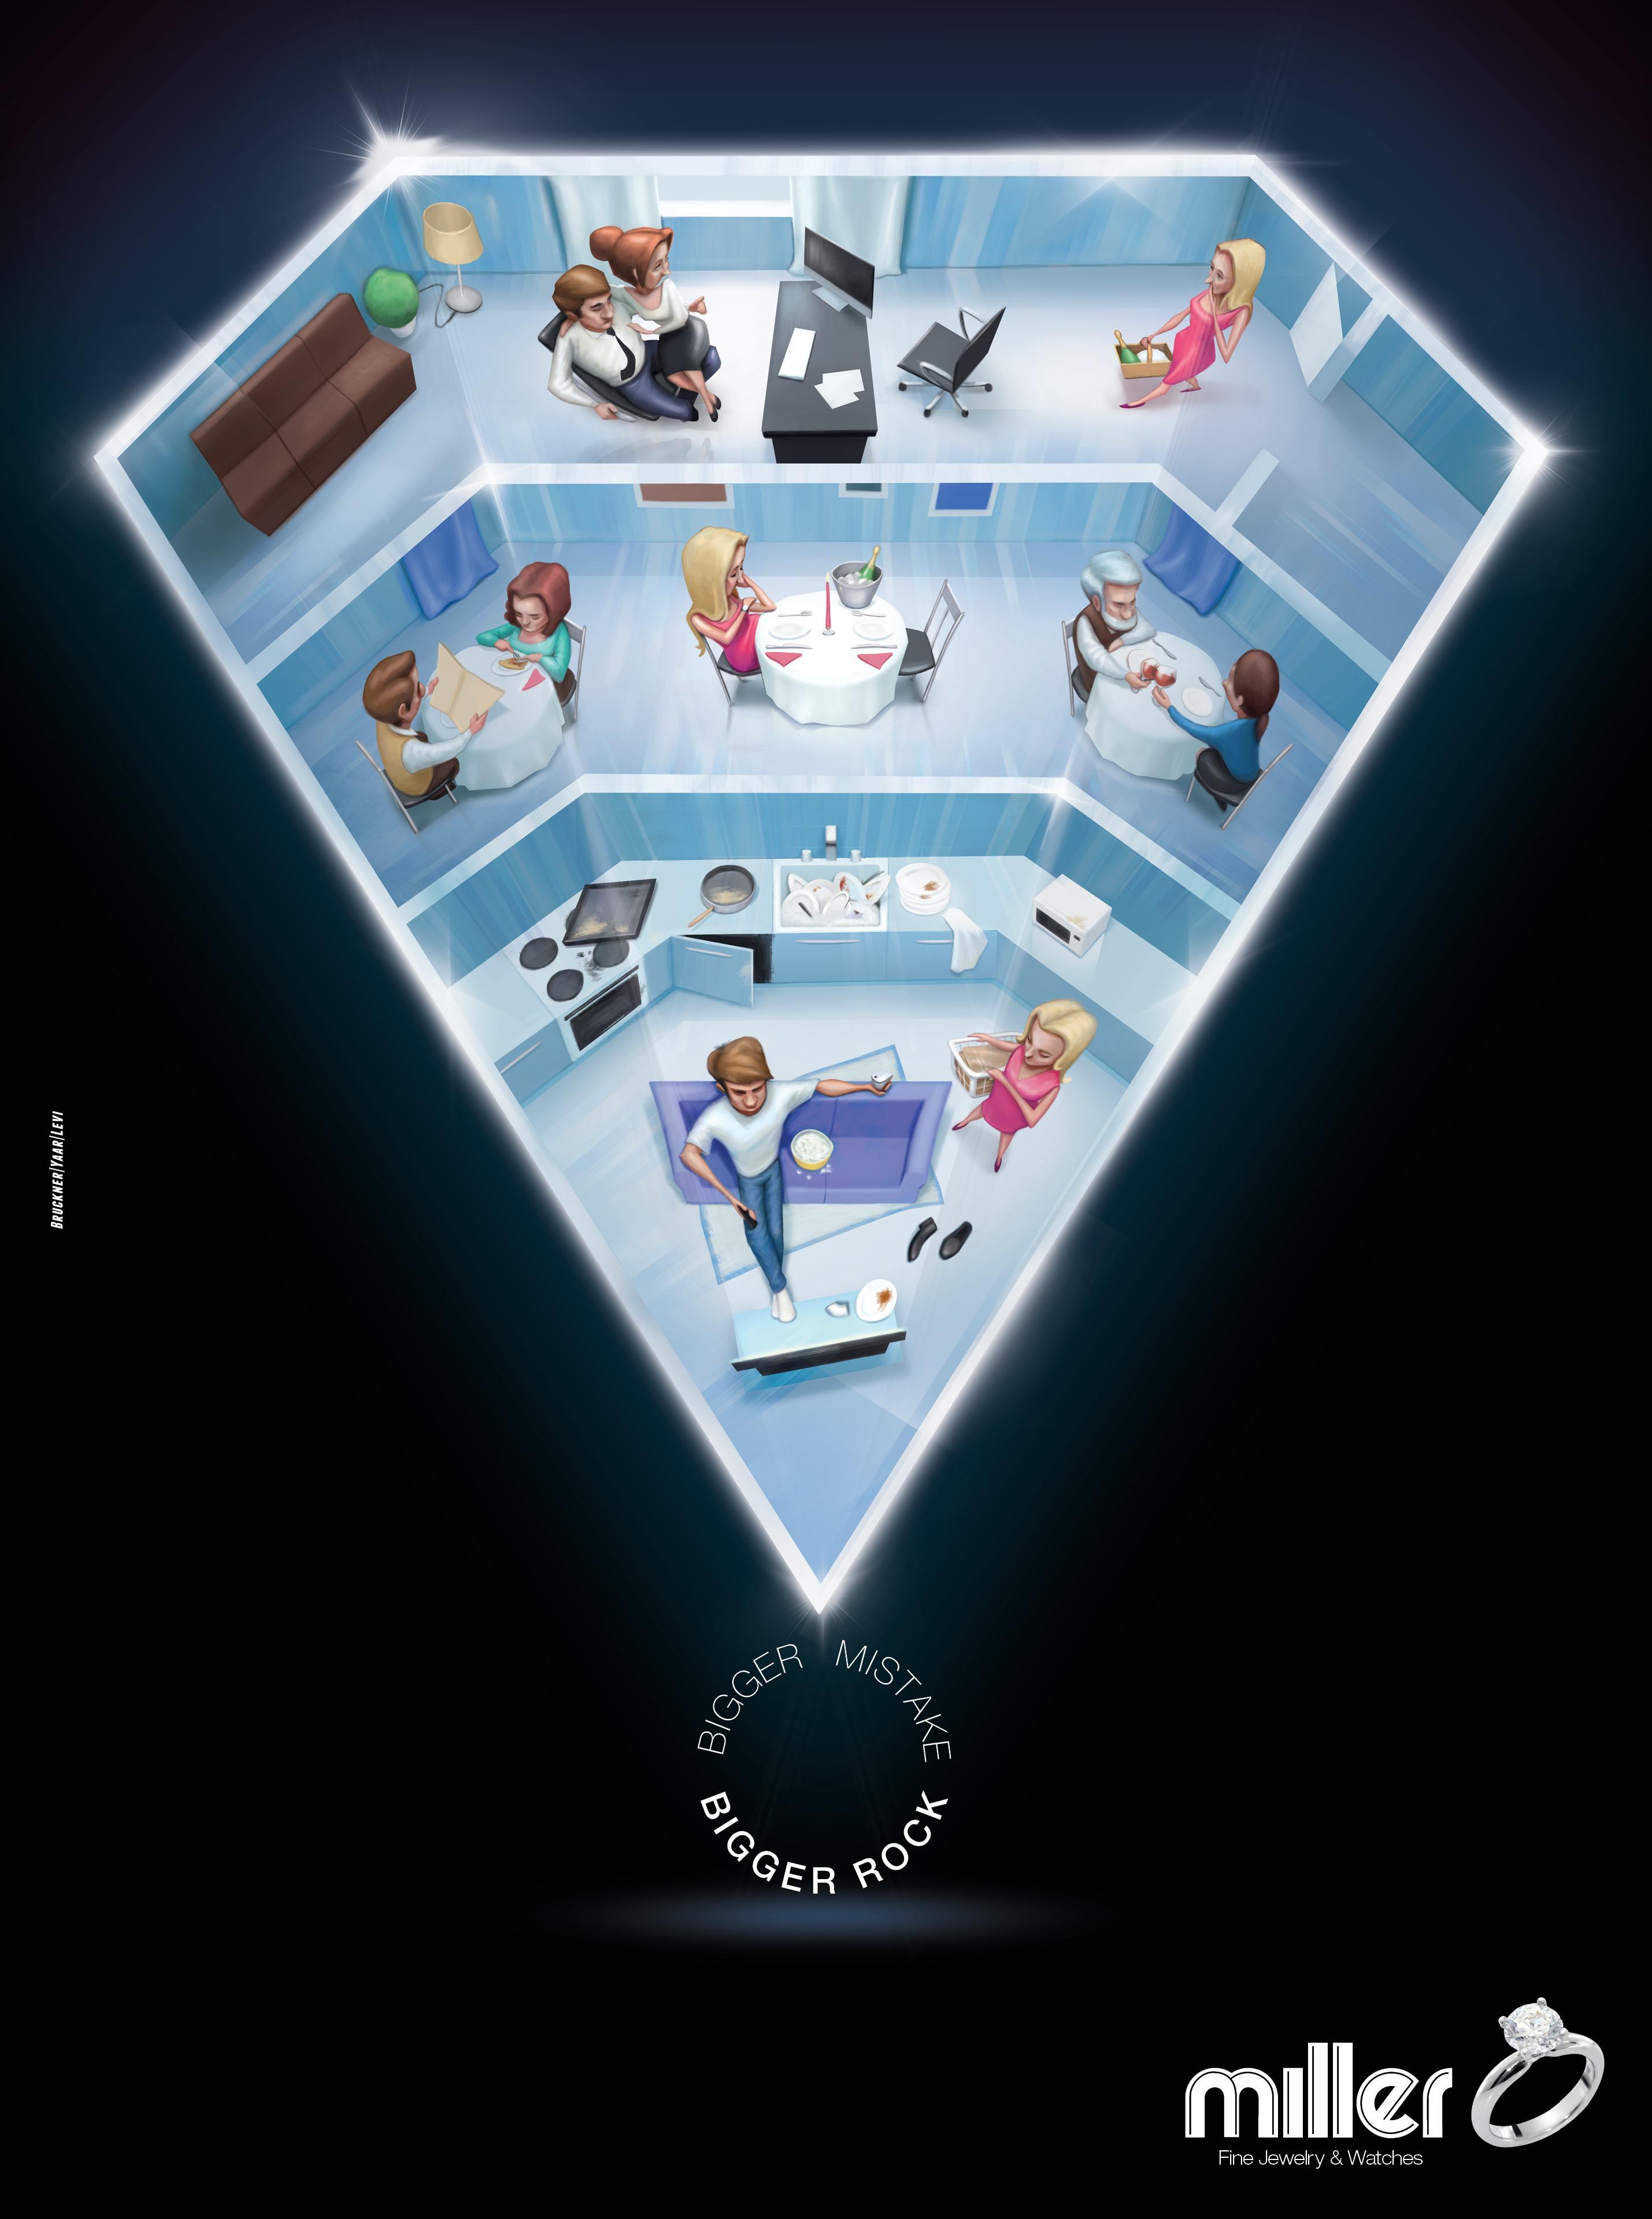 Miller Print Ad - The diamond